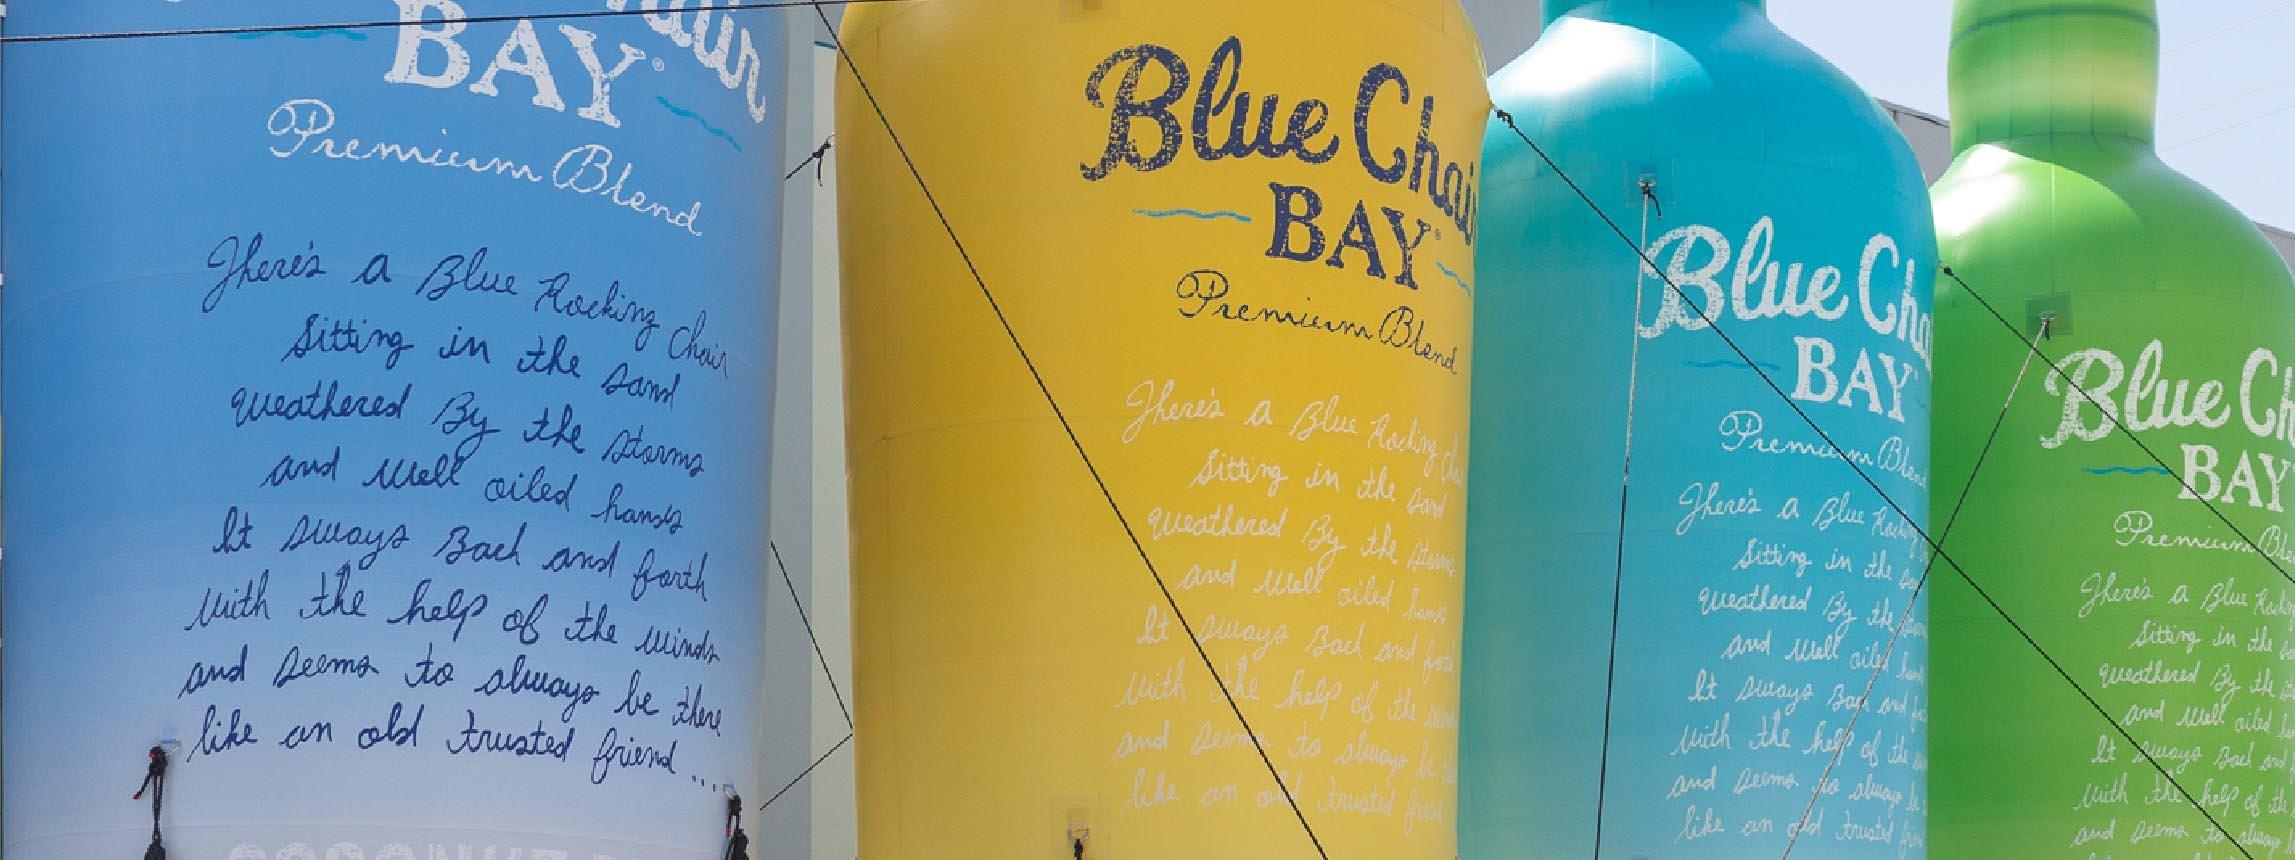 blue-chair-bay-rum-inflatable-bottles.jpg